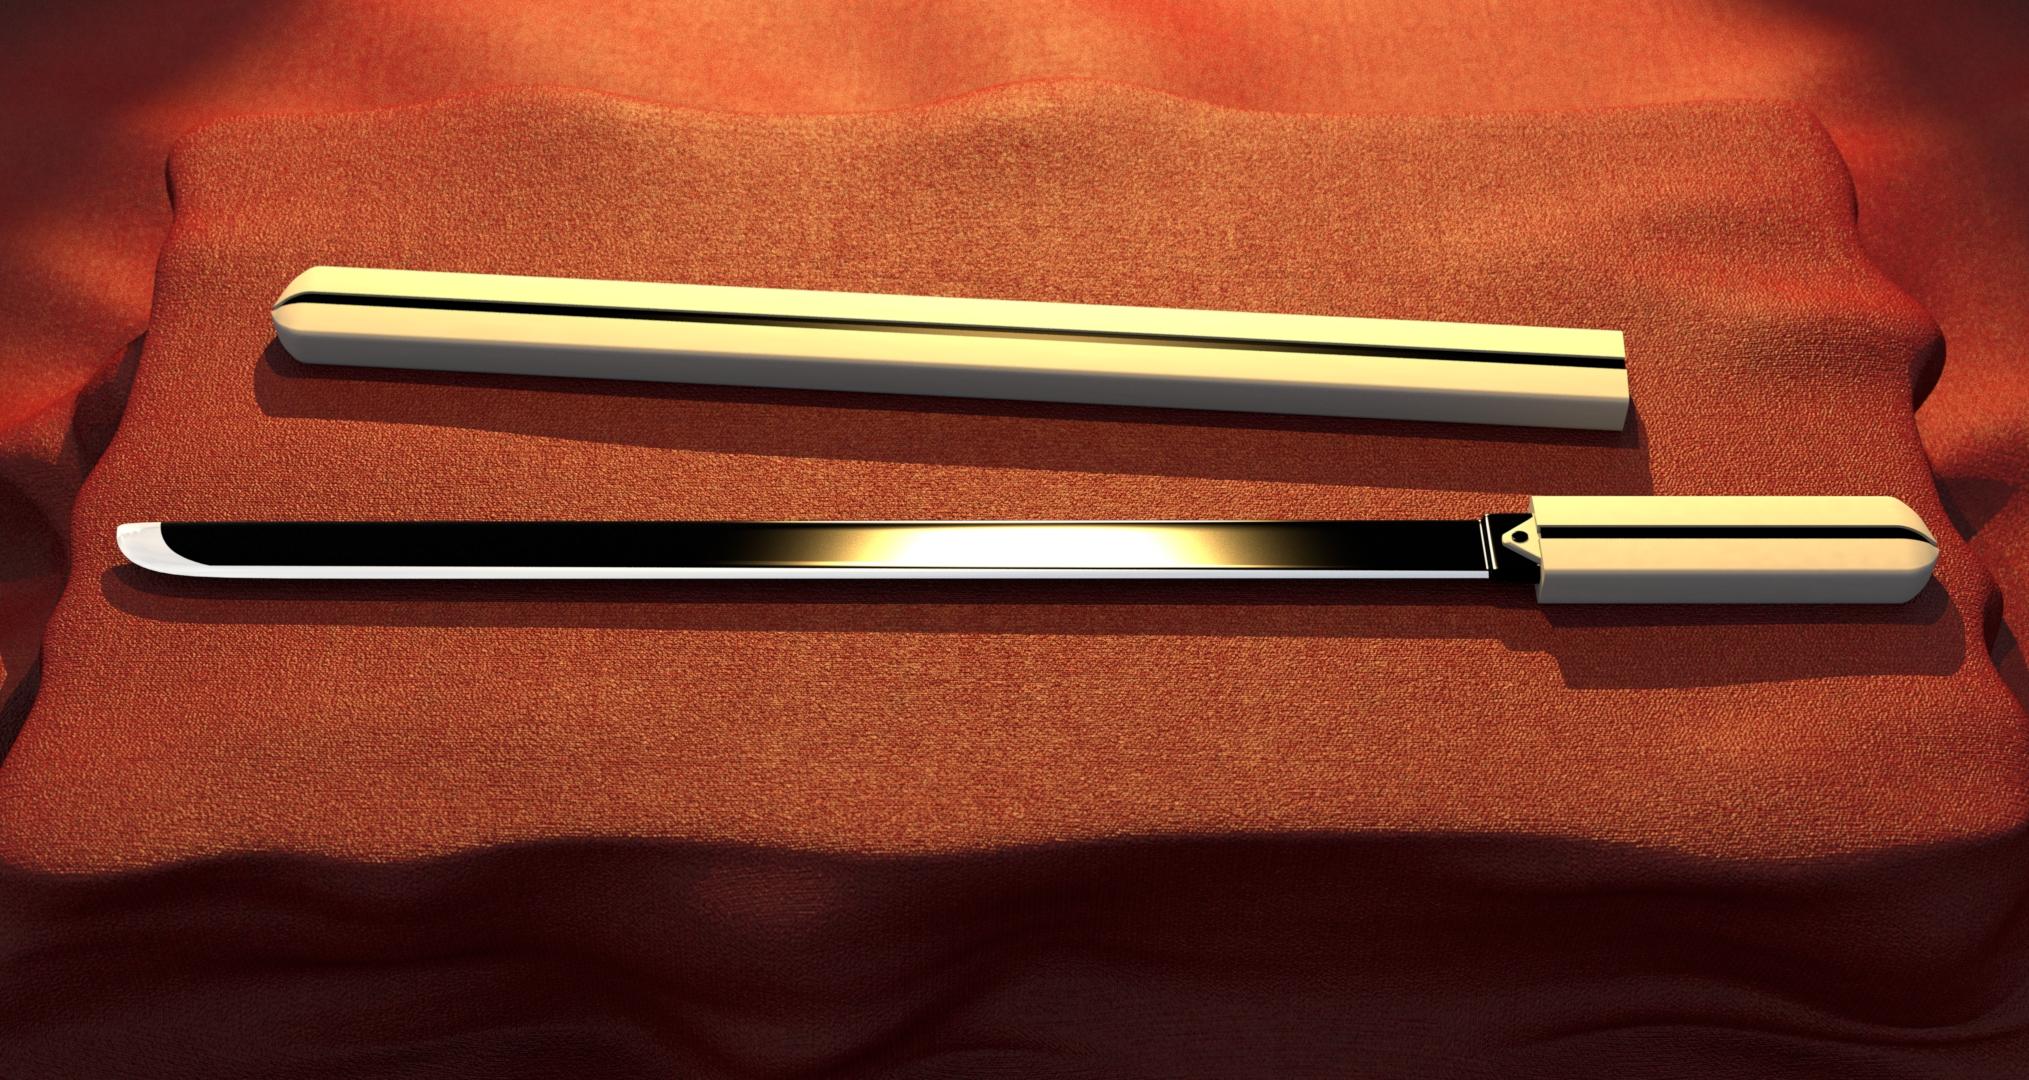 [Image: chokuto_sword_by_kylergillespie-d8iqtvw.jpg]